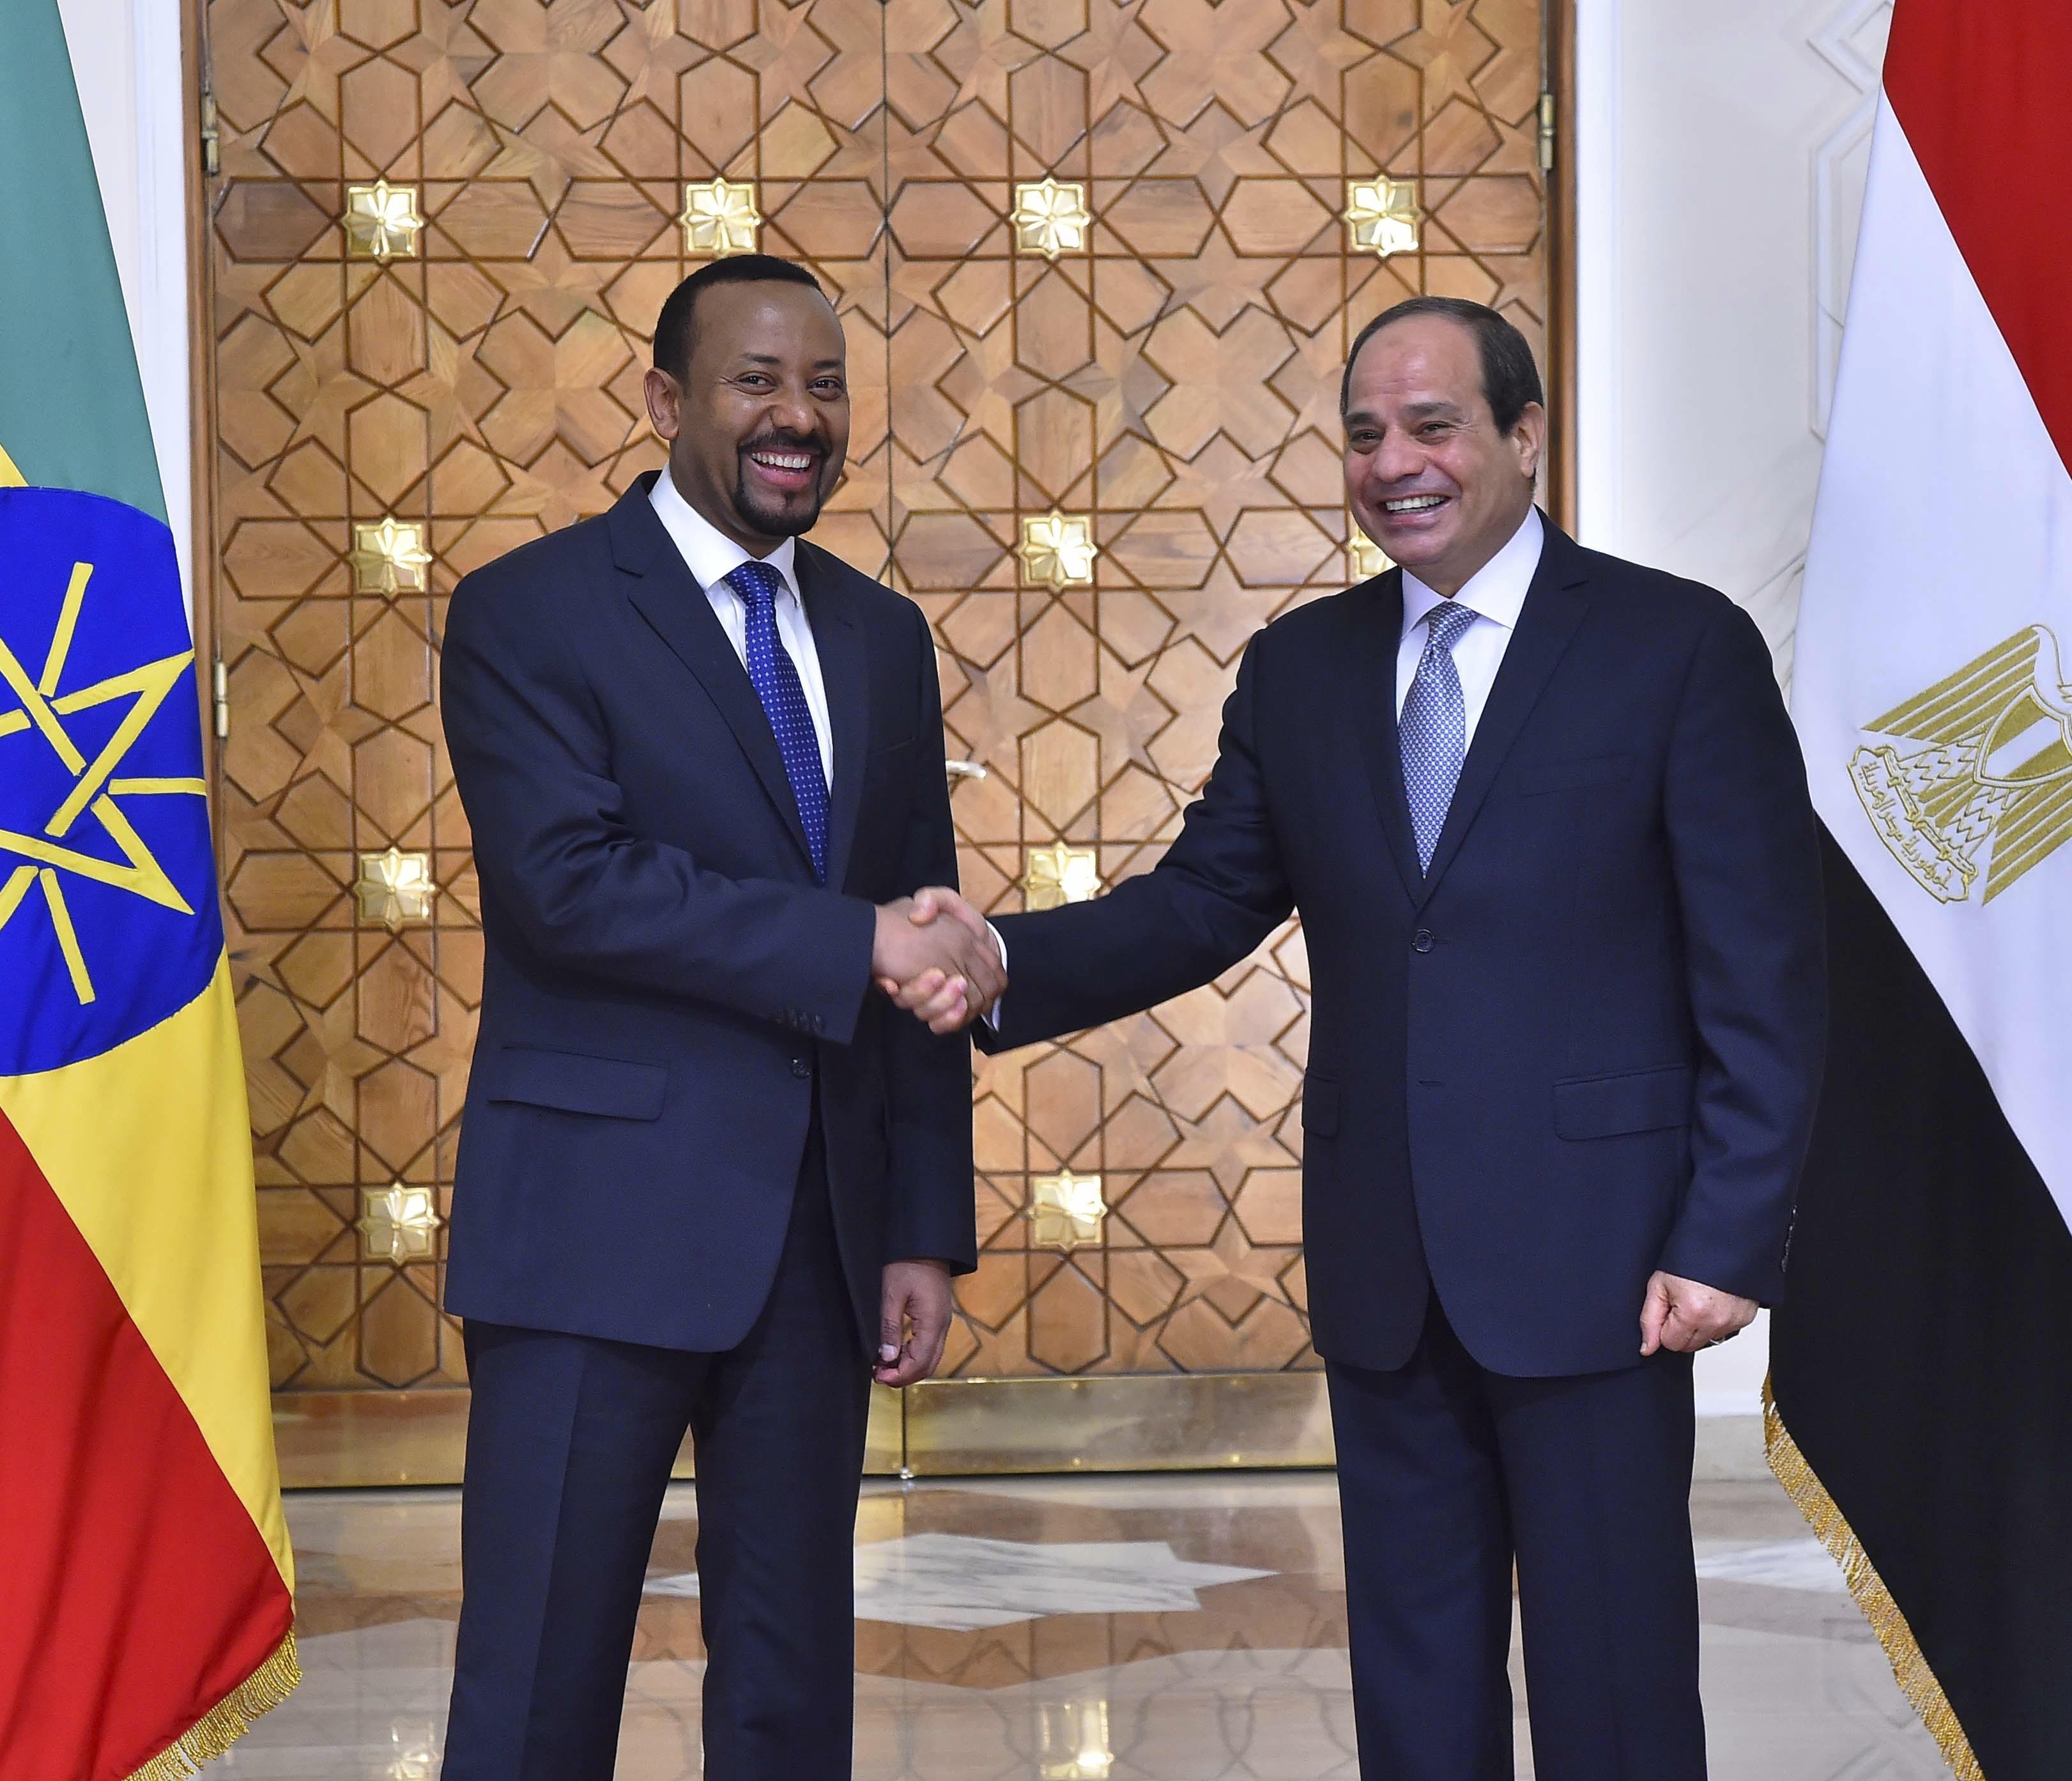 Ethiopia's Grand Renaissance Dam battles Egypt, Sudan on the Nile